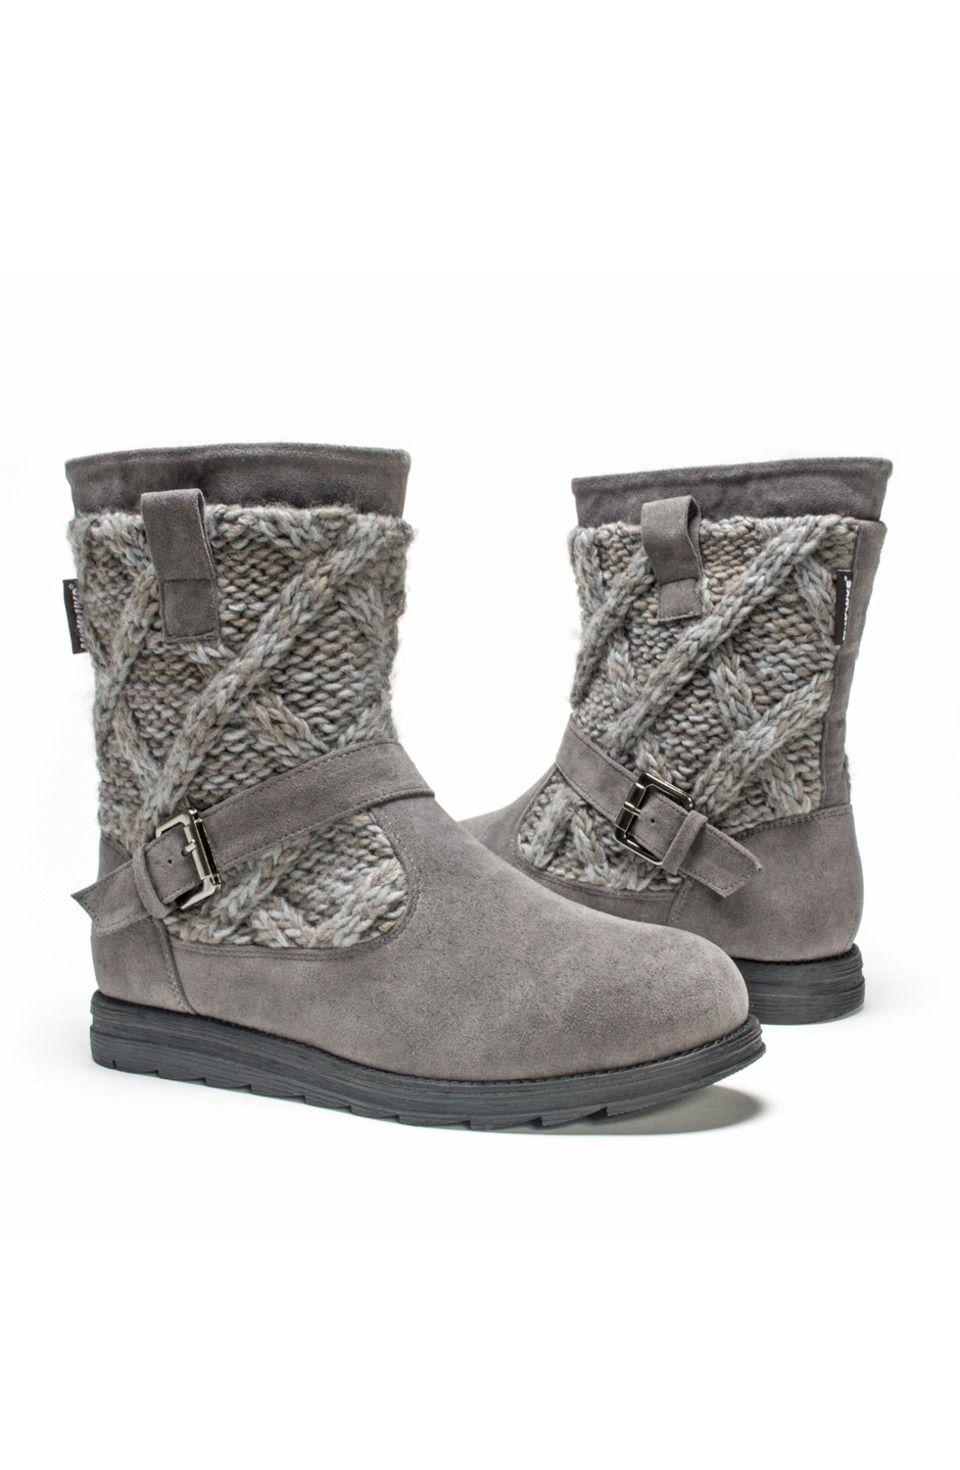 a43cb0d5389 muk luks - Gina Boots in Medium Gray | Shoe's, flats and high heels ...